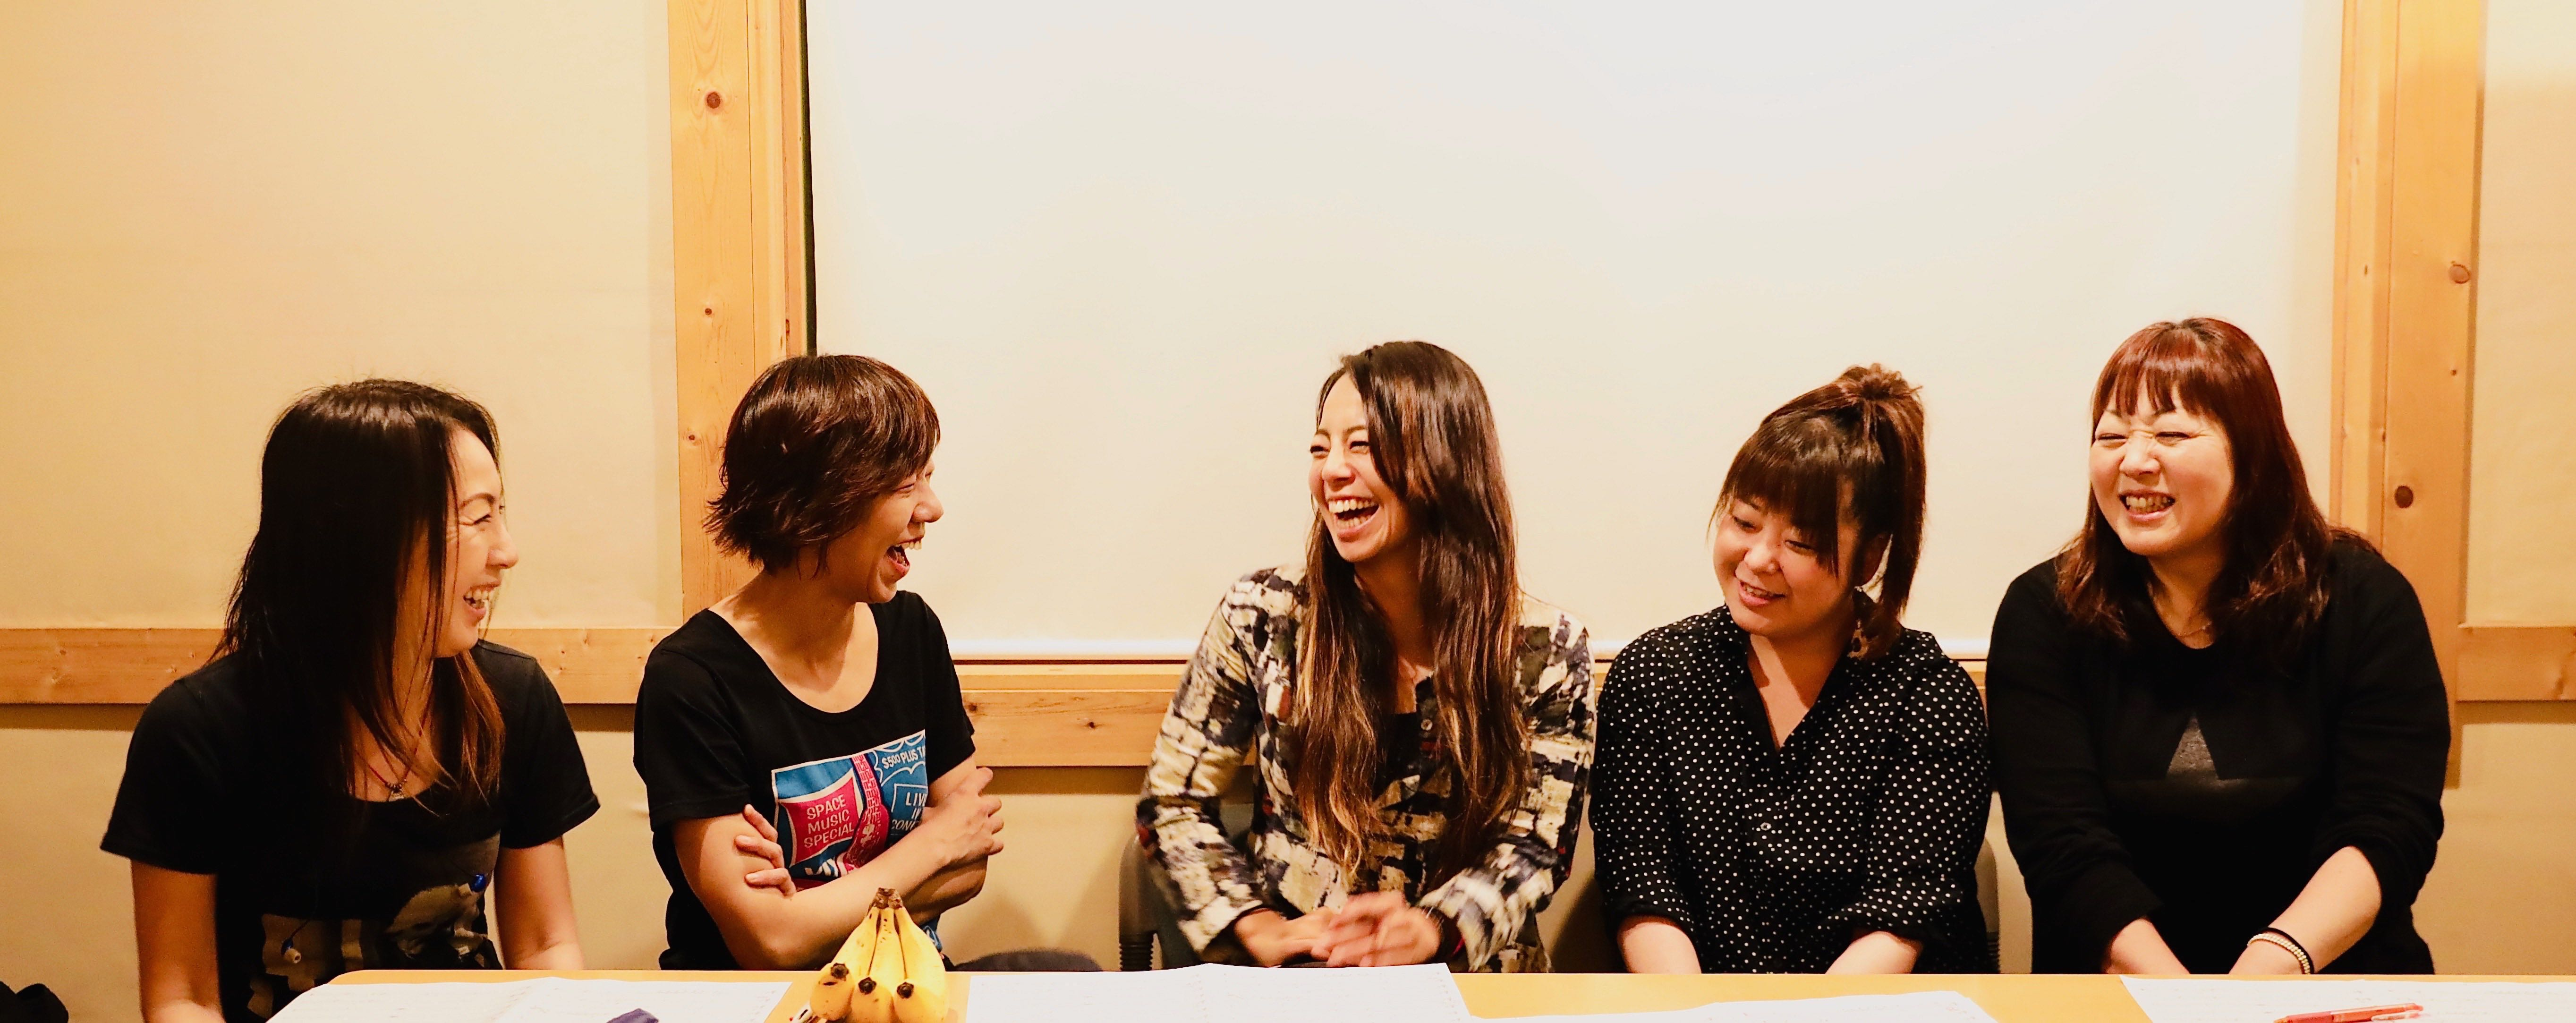 The Wonder Ladies 〜アルバム発売記念ライブ〜